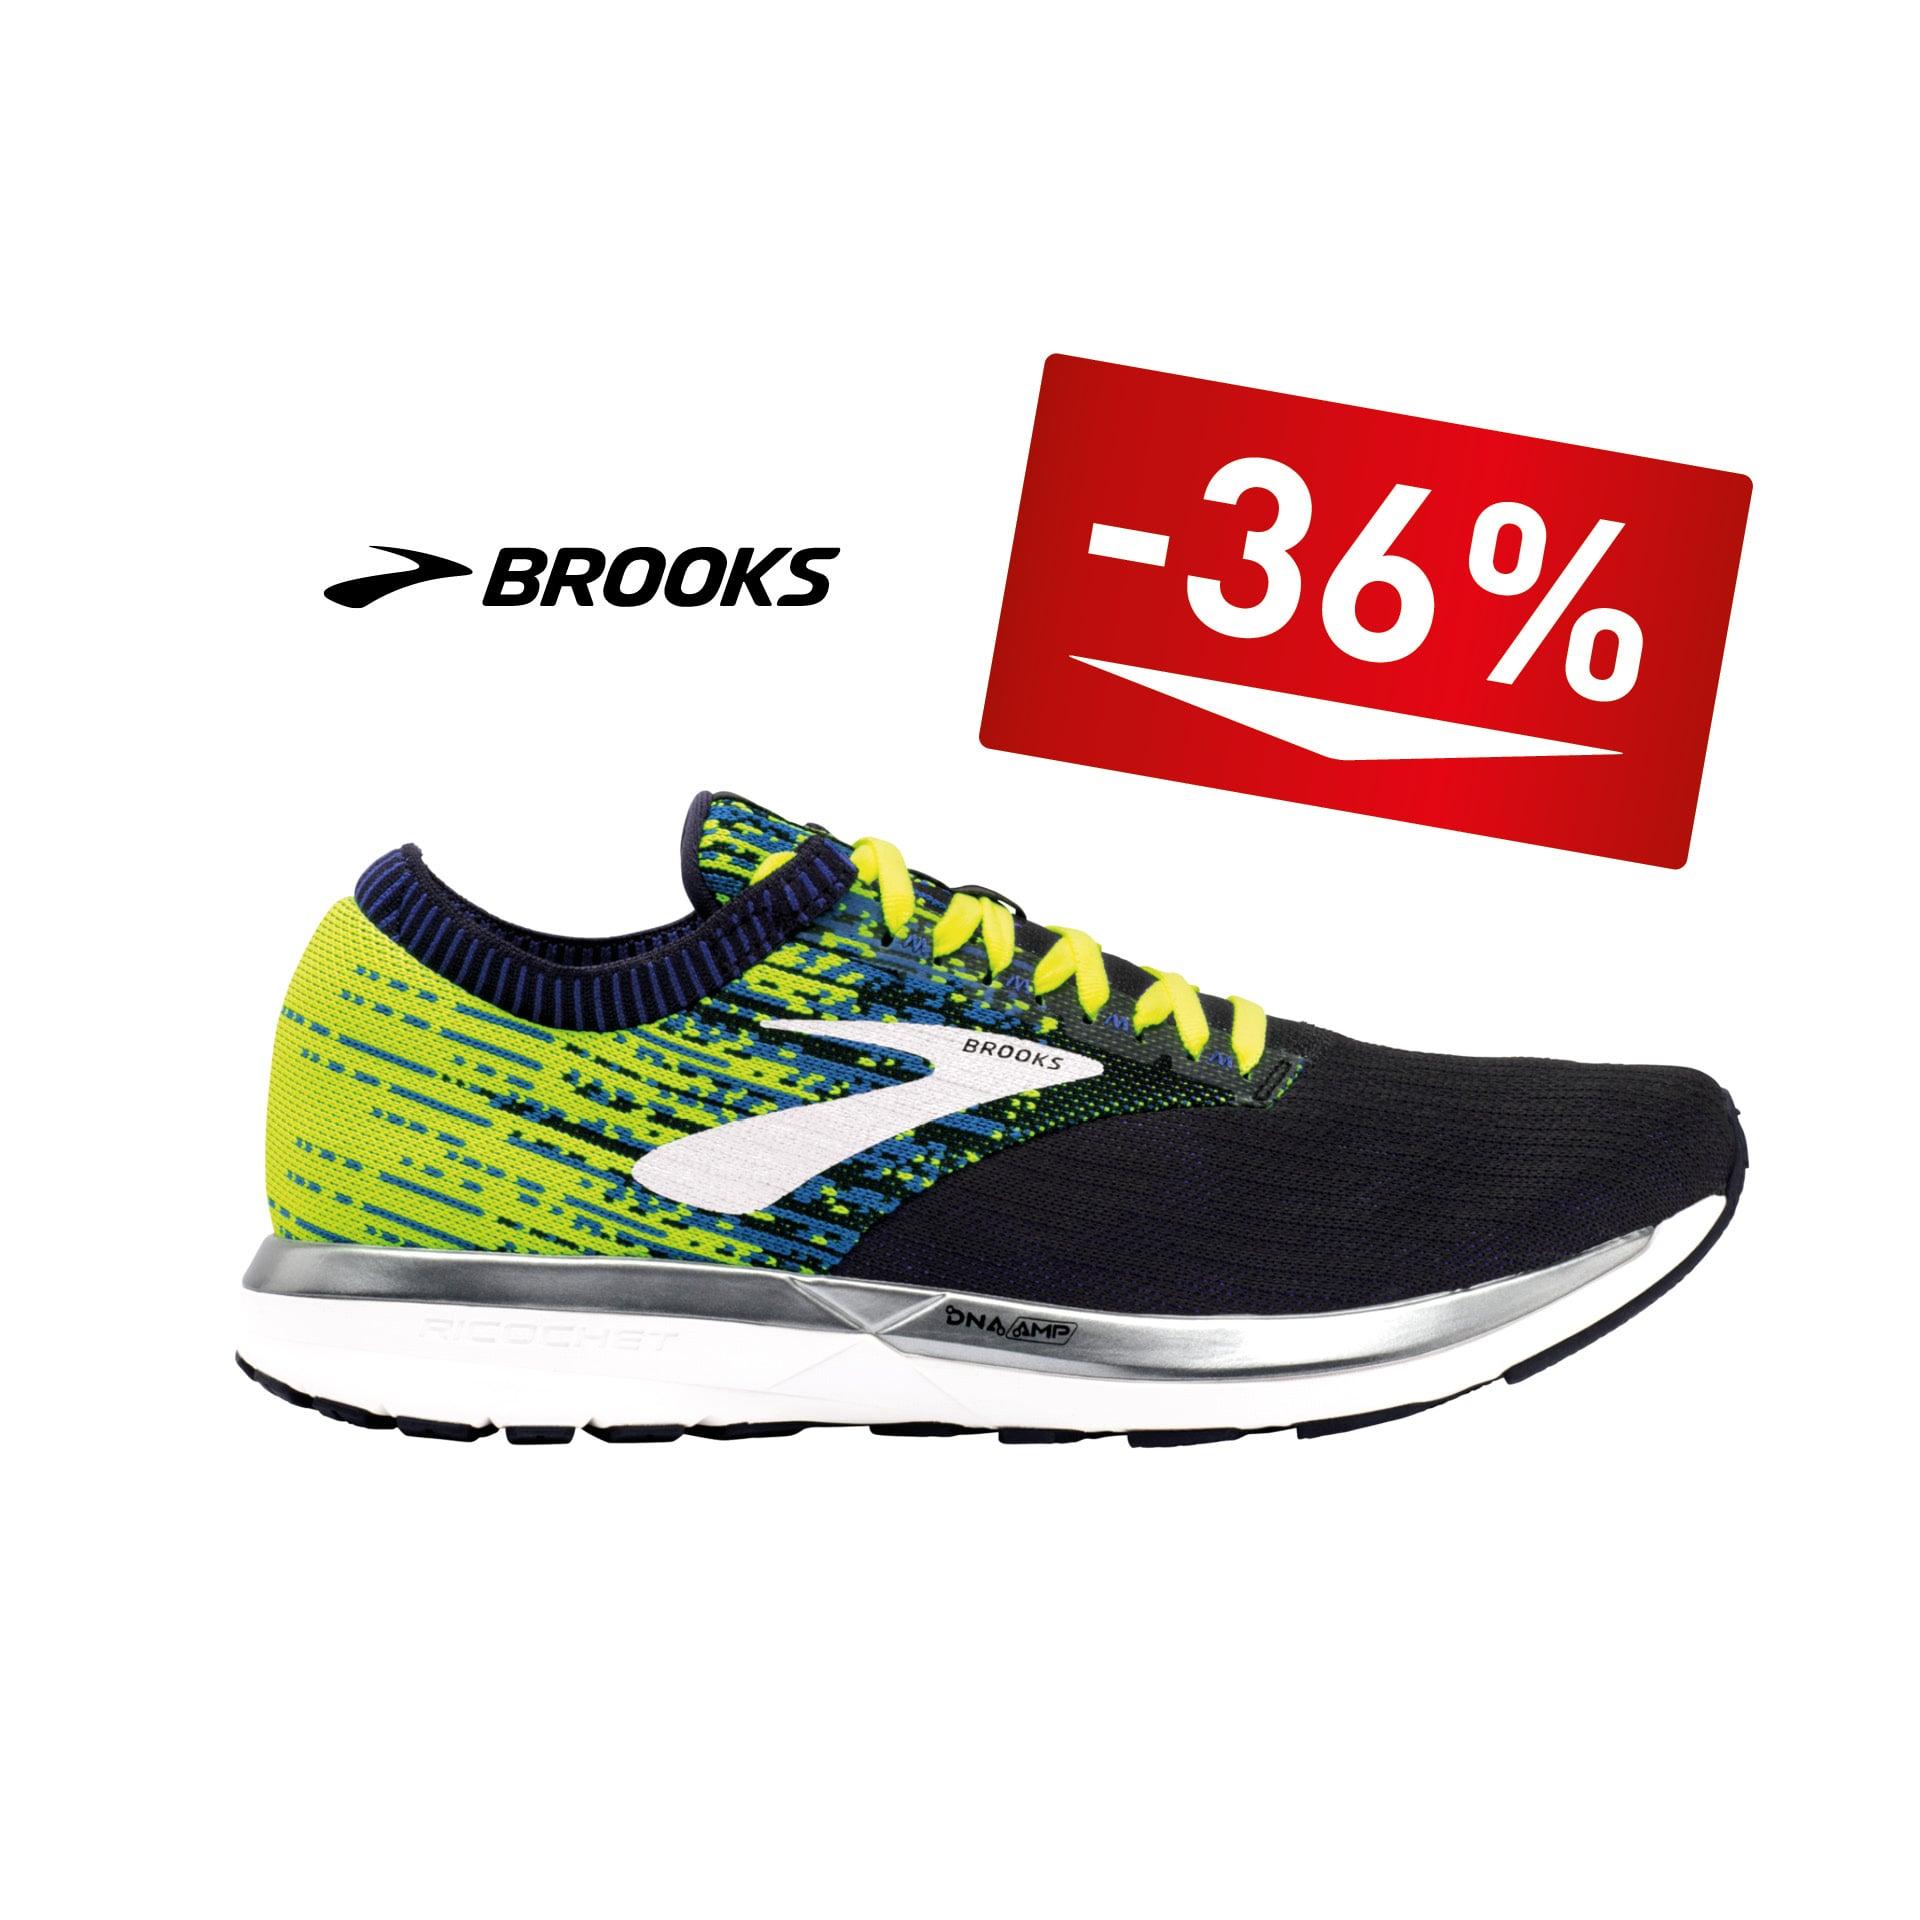 Brooks Laufschuh Ricochet -36%